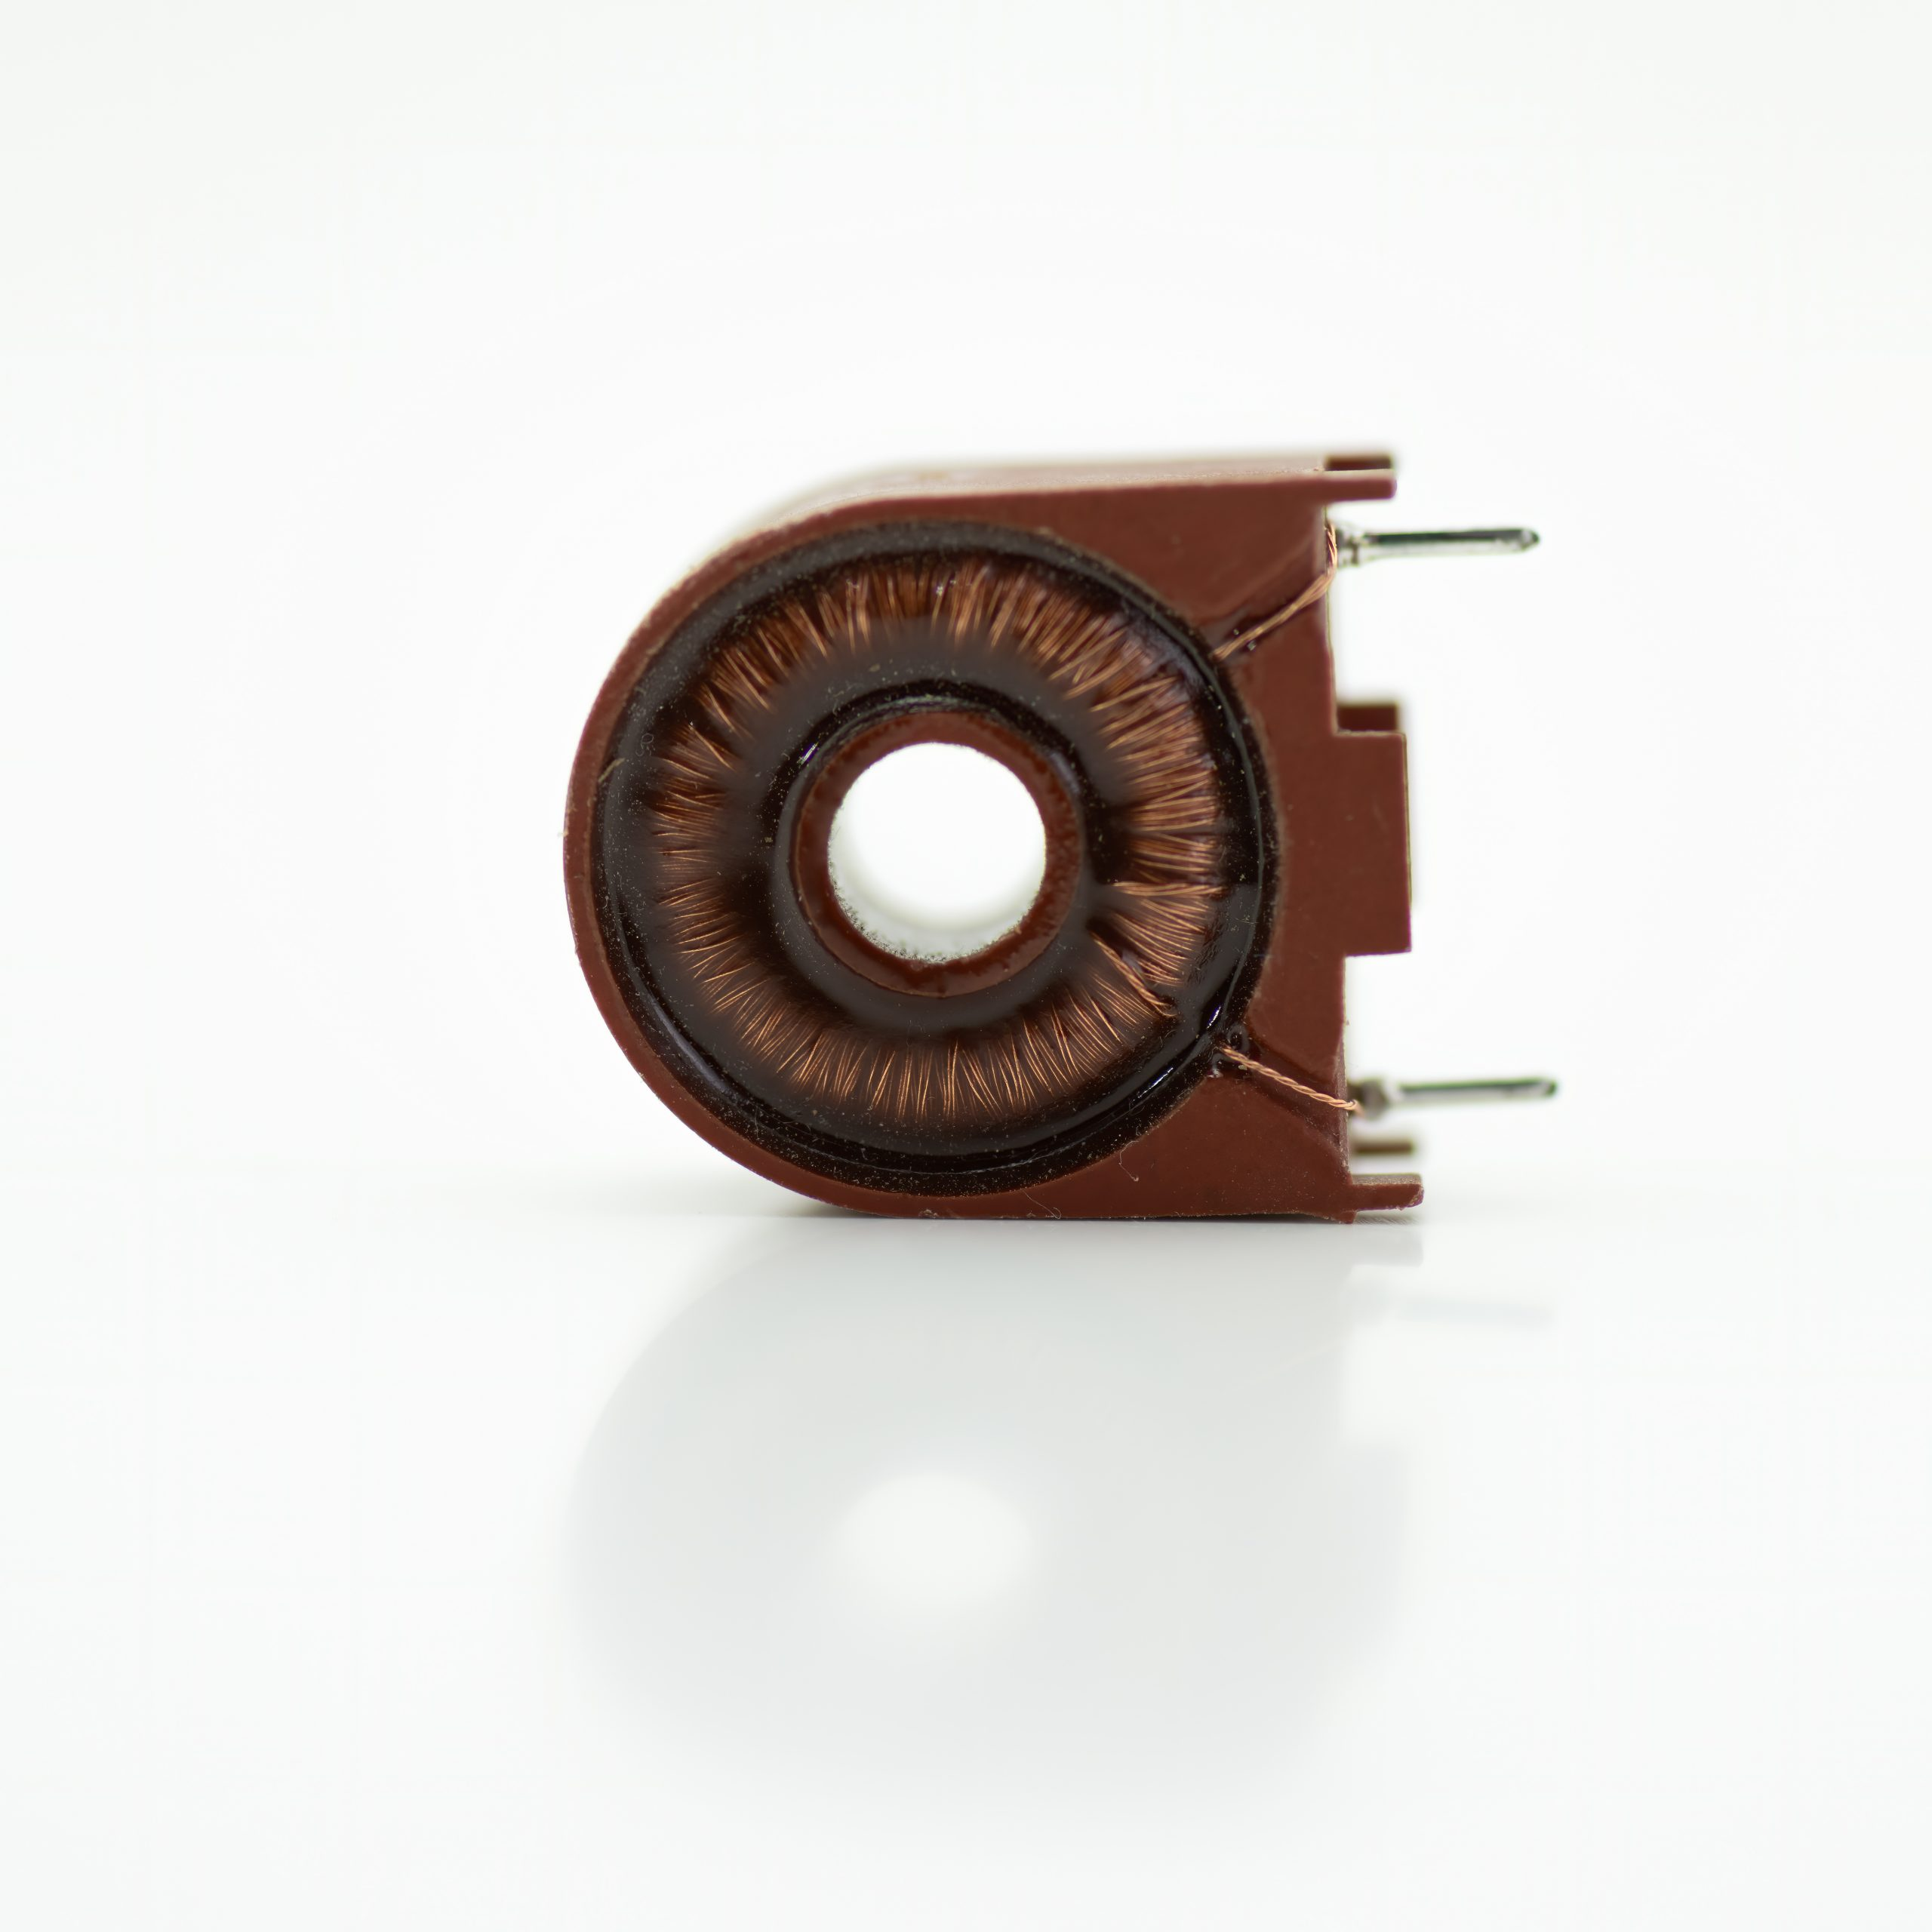 ELANTAS Electrical Insulation